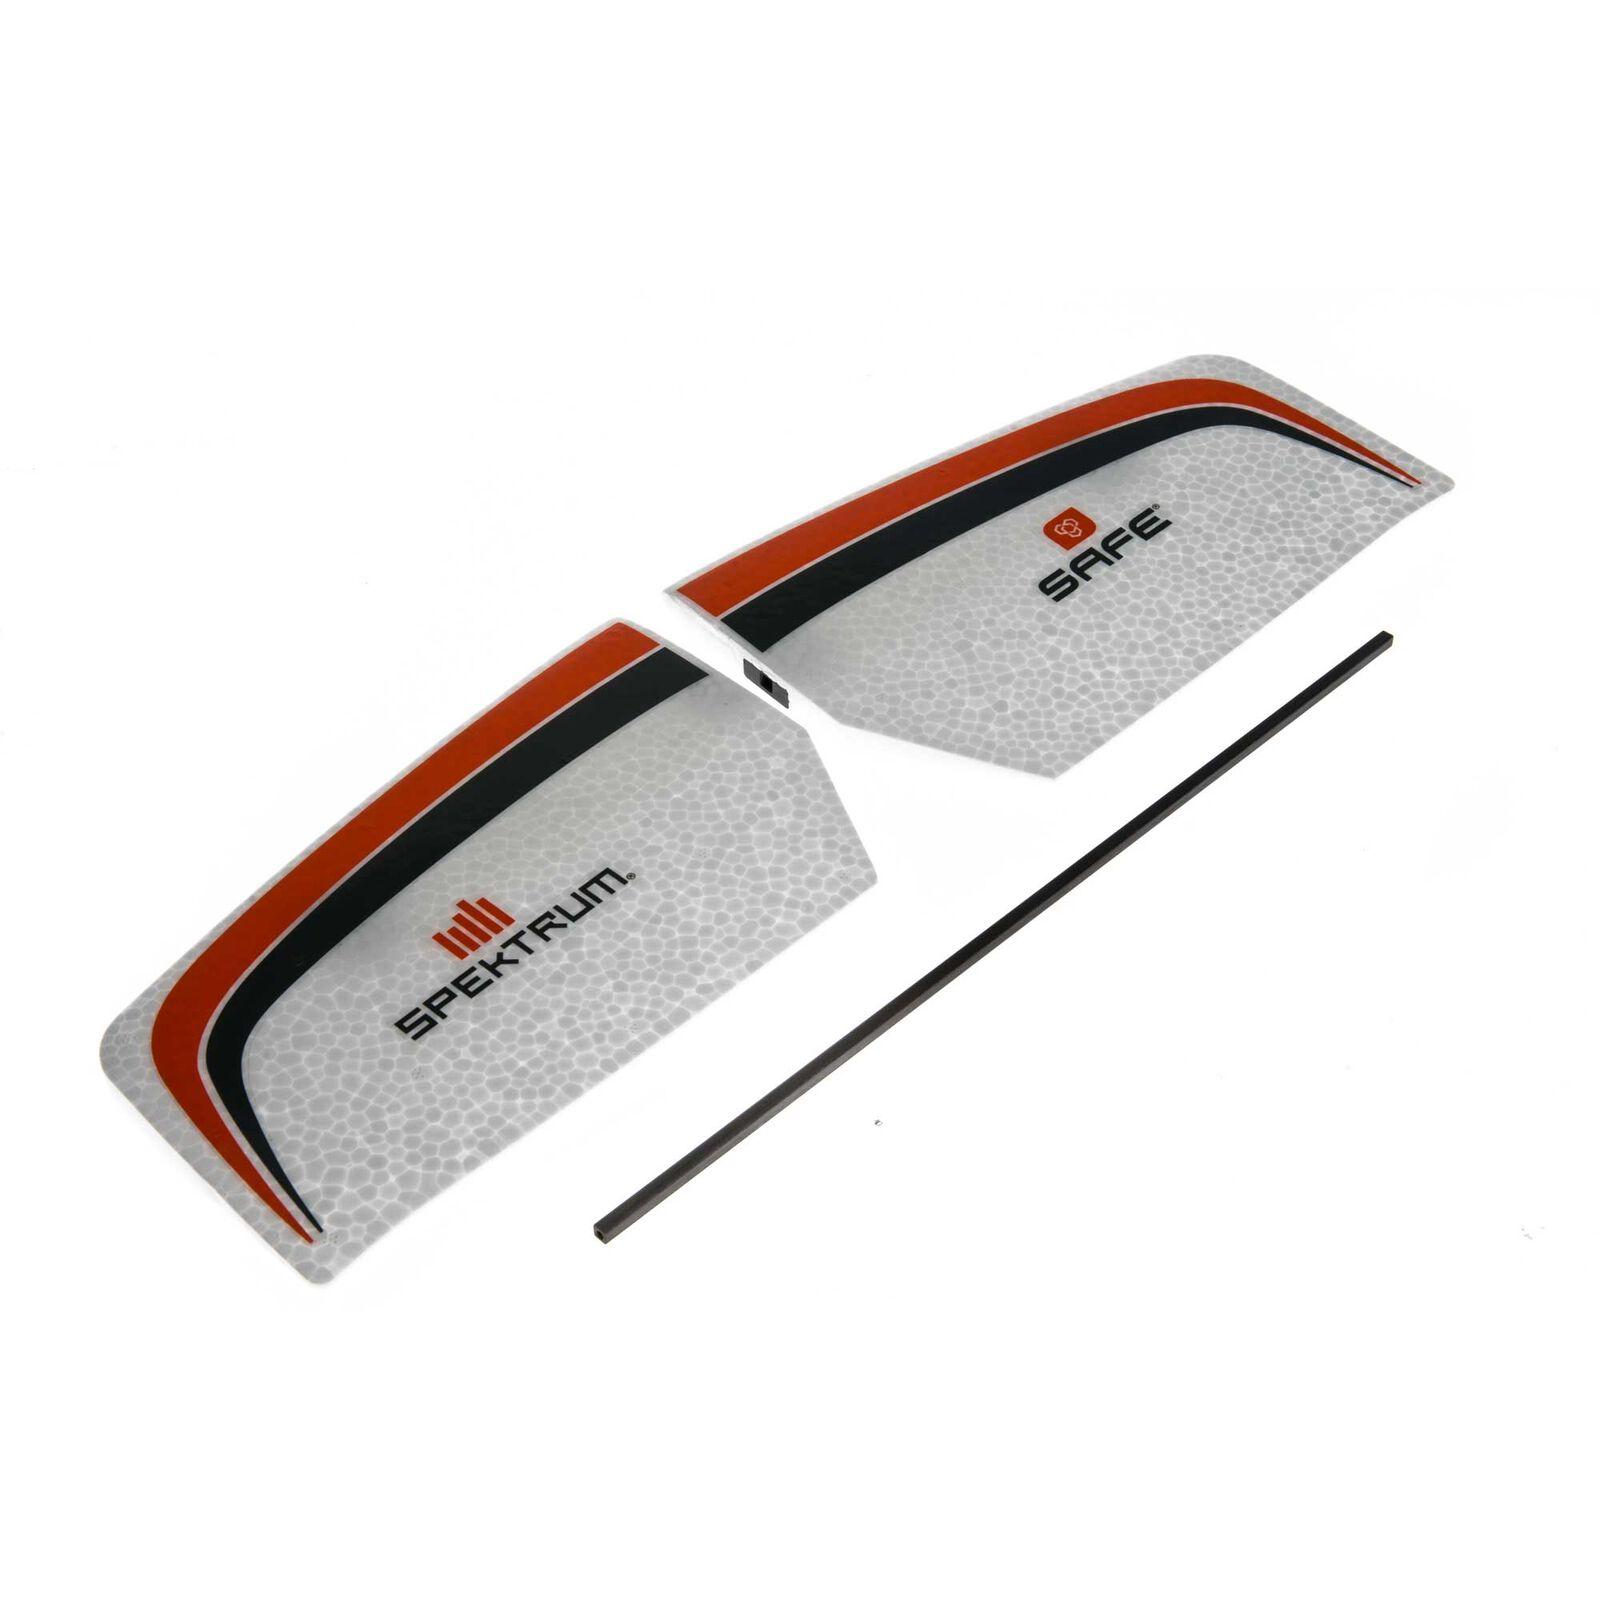 Horizontal Stab Set: AeroScout